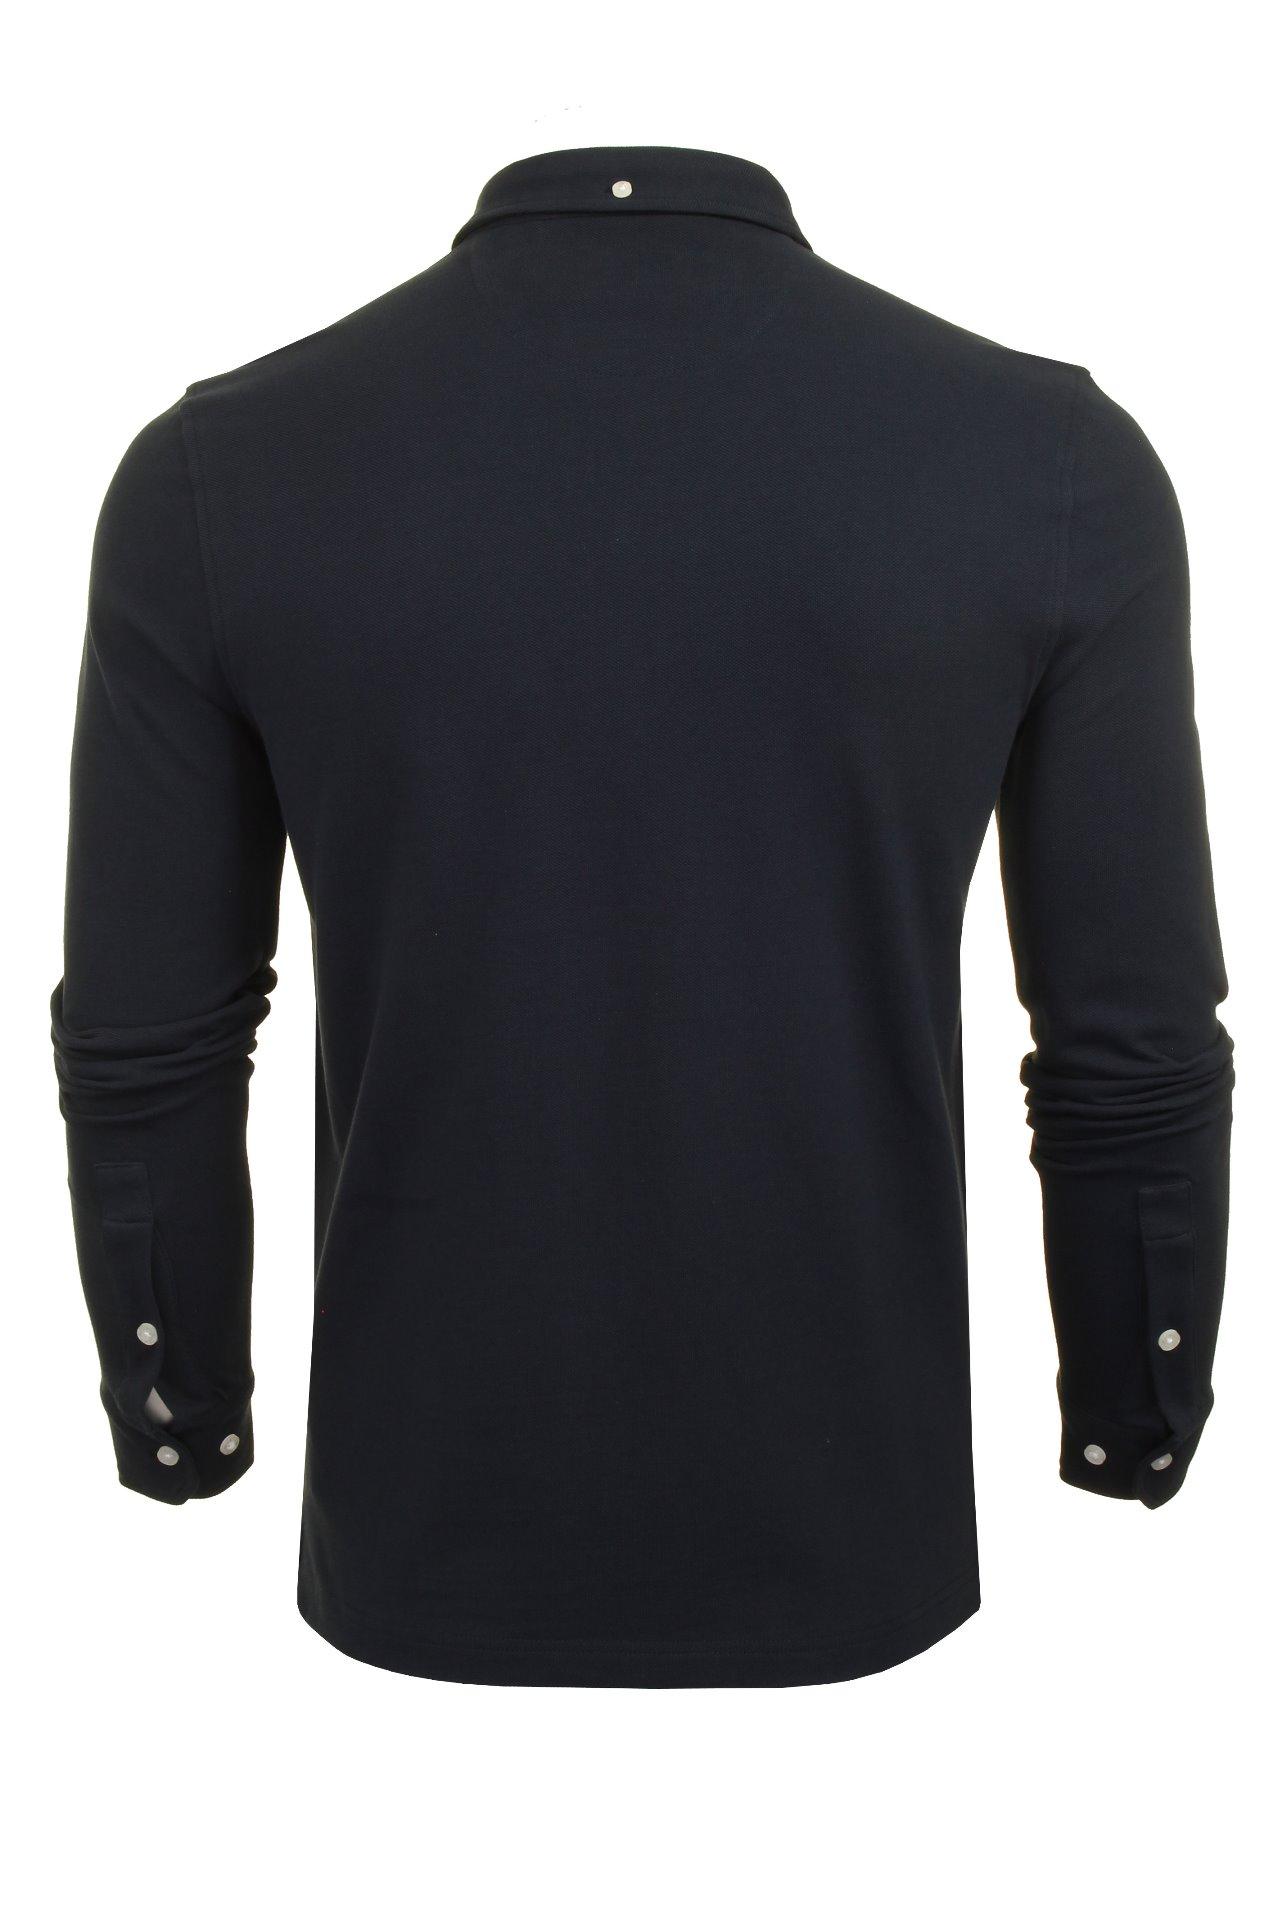 Farah-Mens-Polo-T-Shirt-039-Ricky-Polo-039-Long-Sleeved thumbnail 8